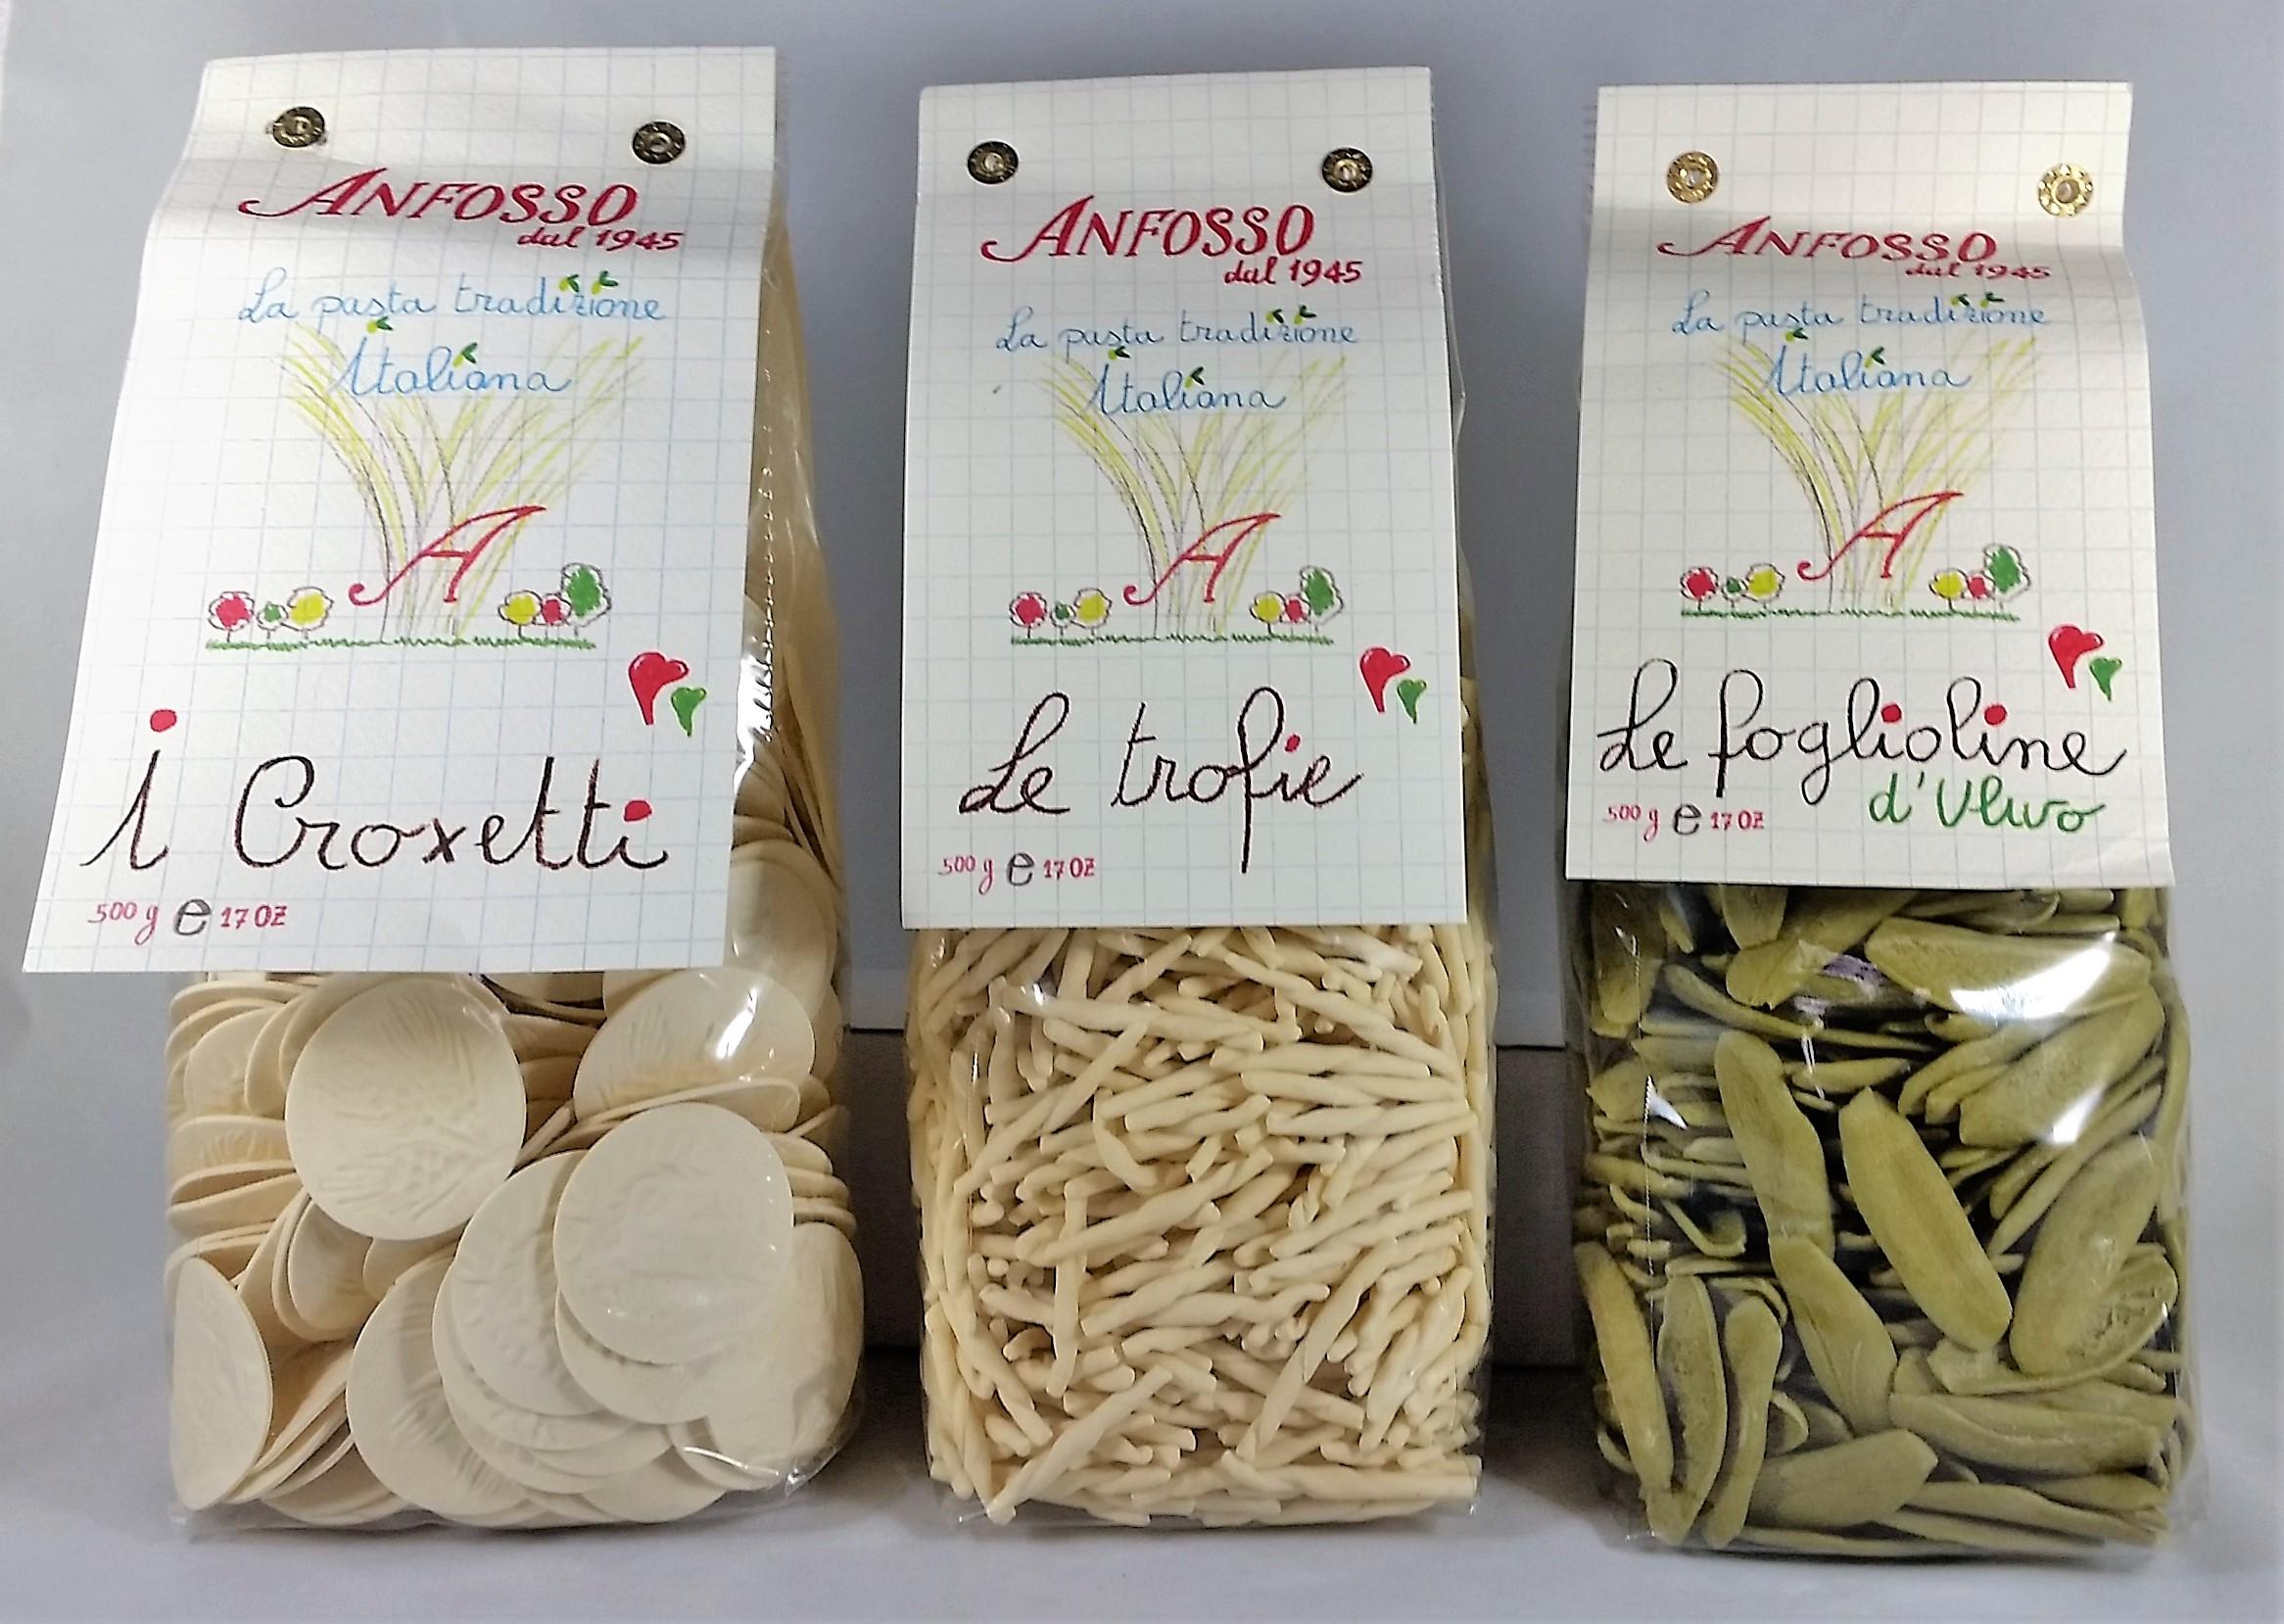 Croxetti pasta, Trofie pasta, Foglie d'ulivo pasta